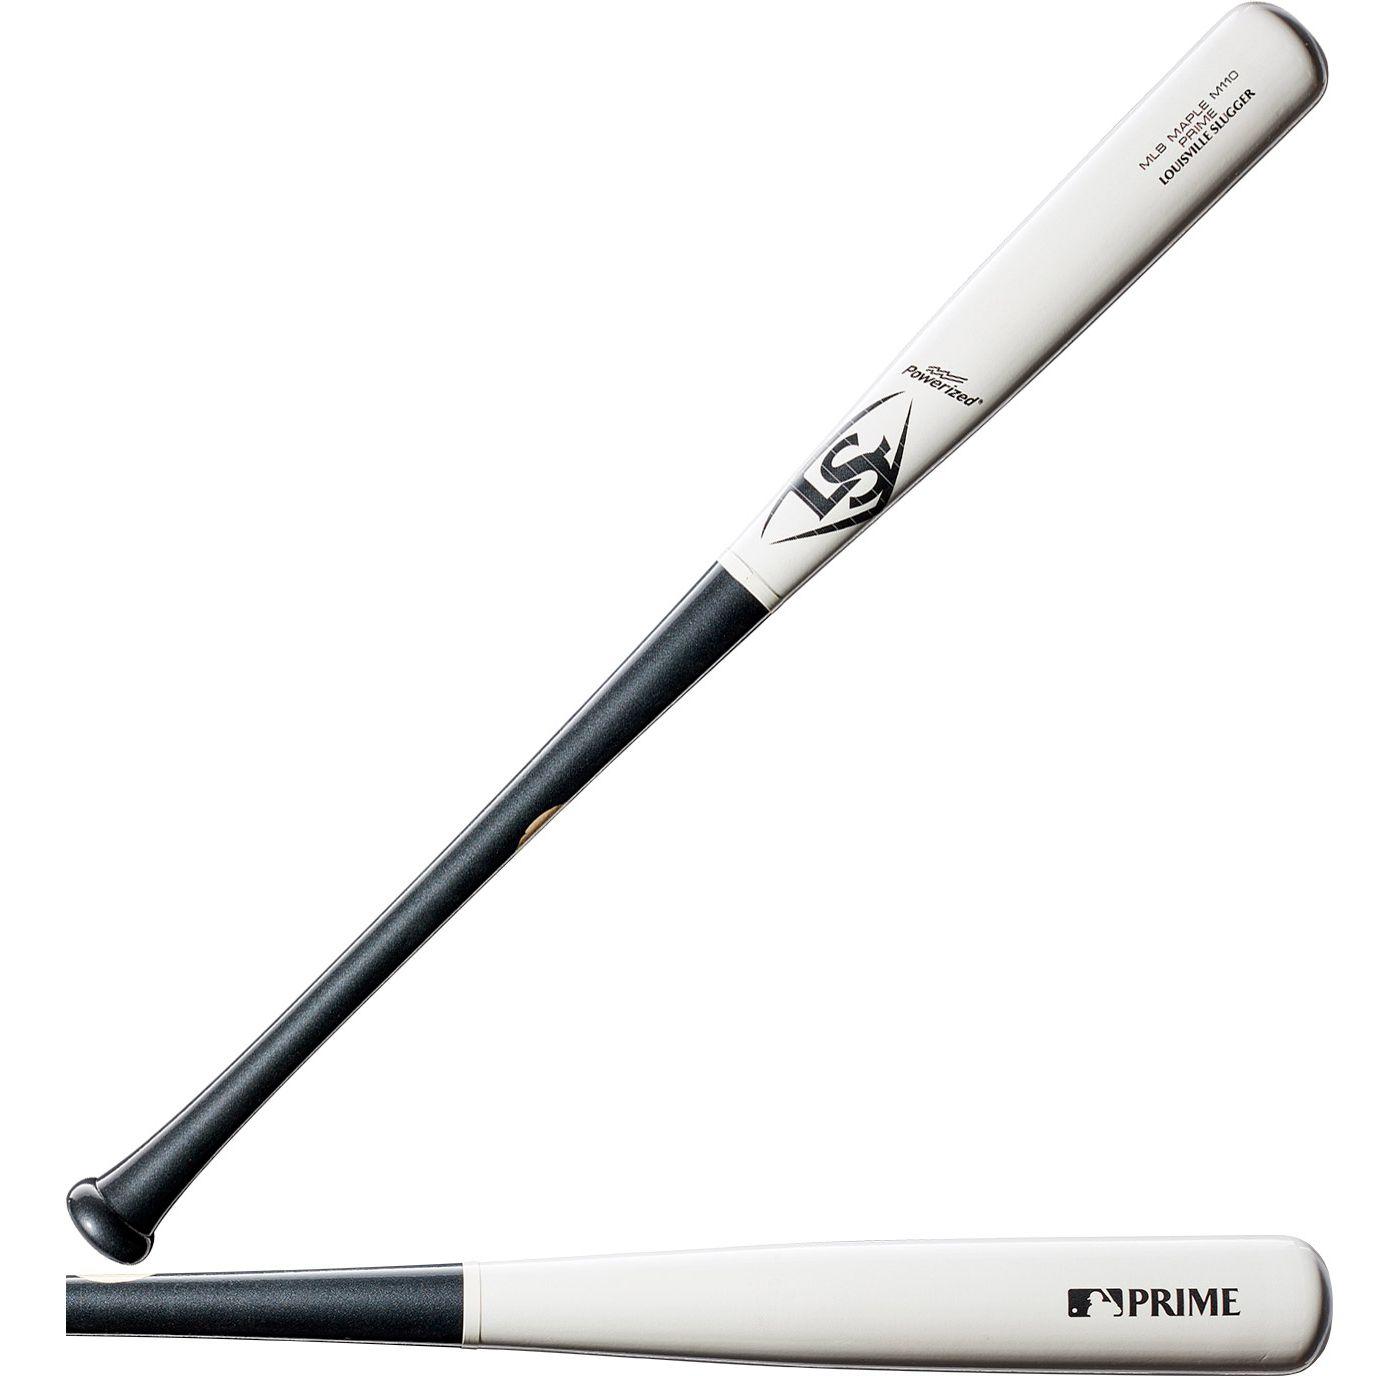 Louisville Slugger MLB Prime M110 Maple Bat